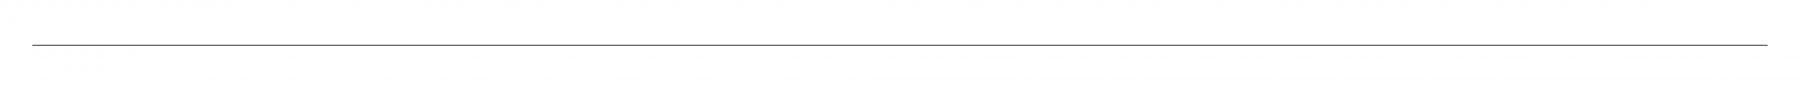 thin line 1 pt-b